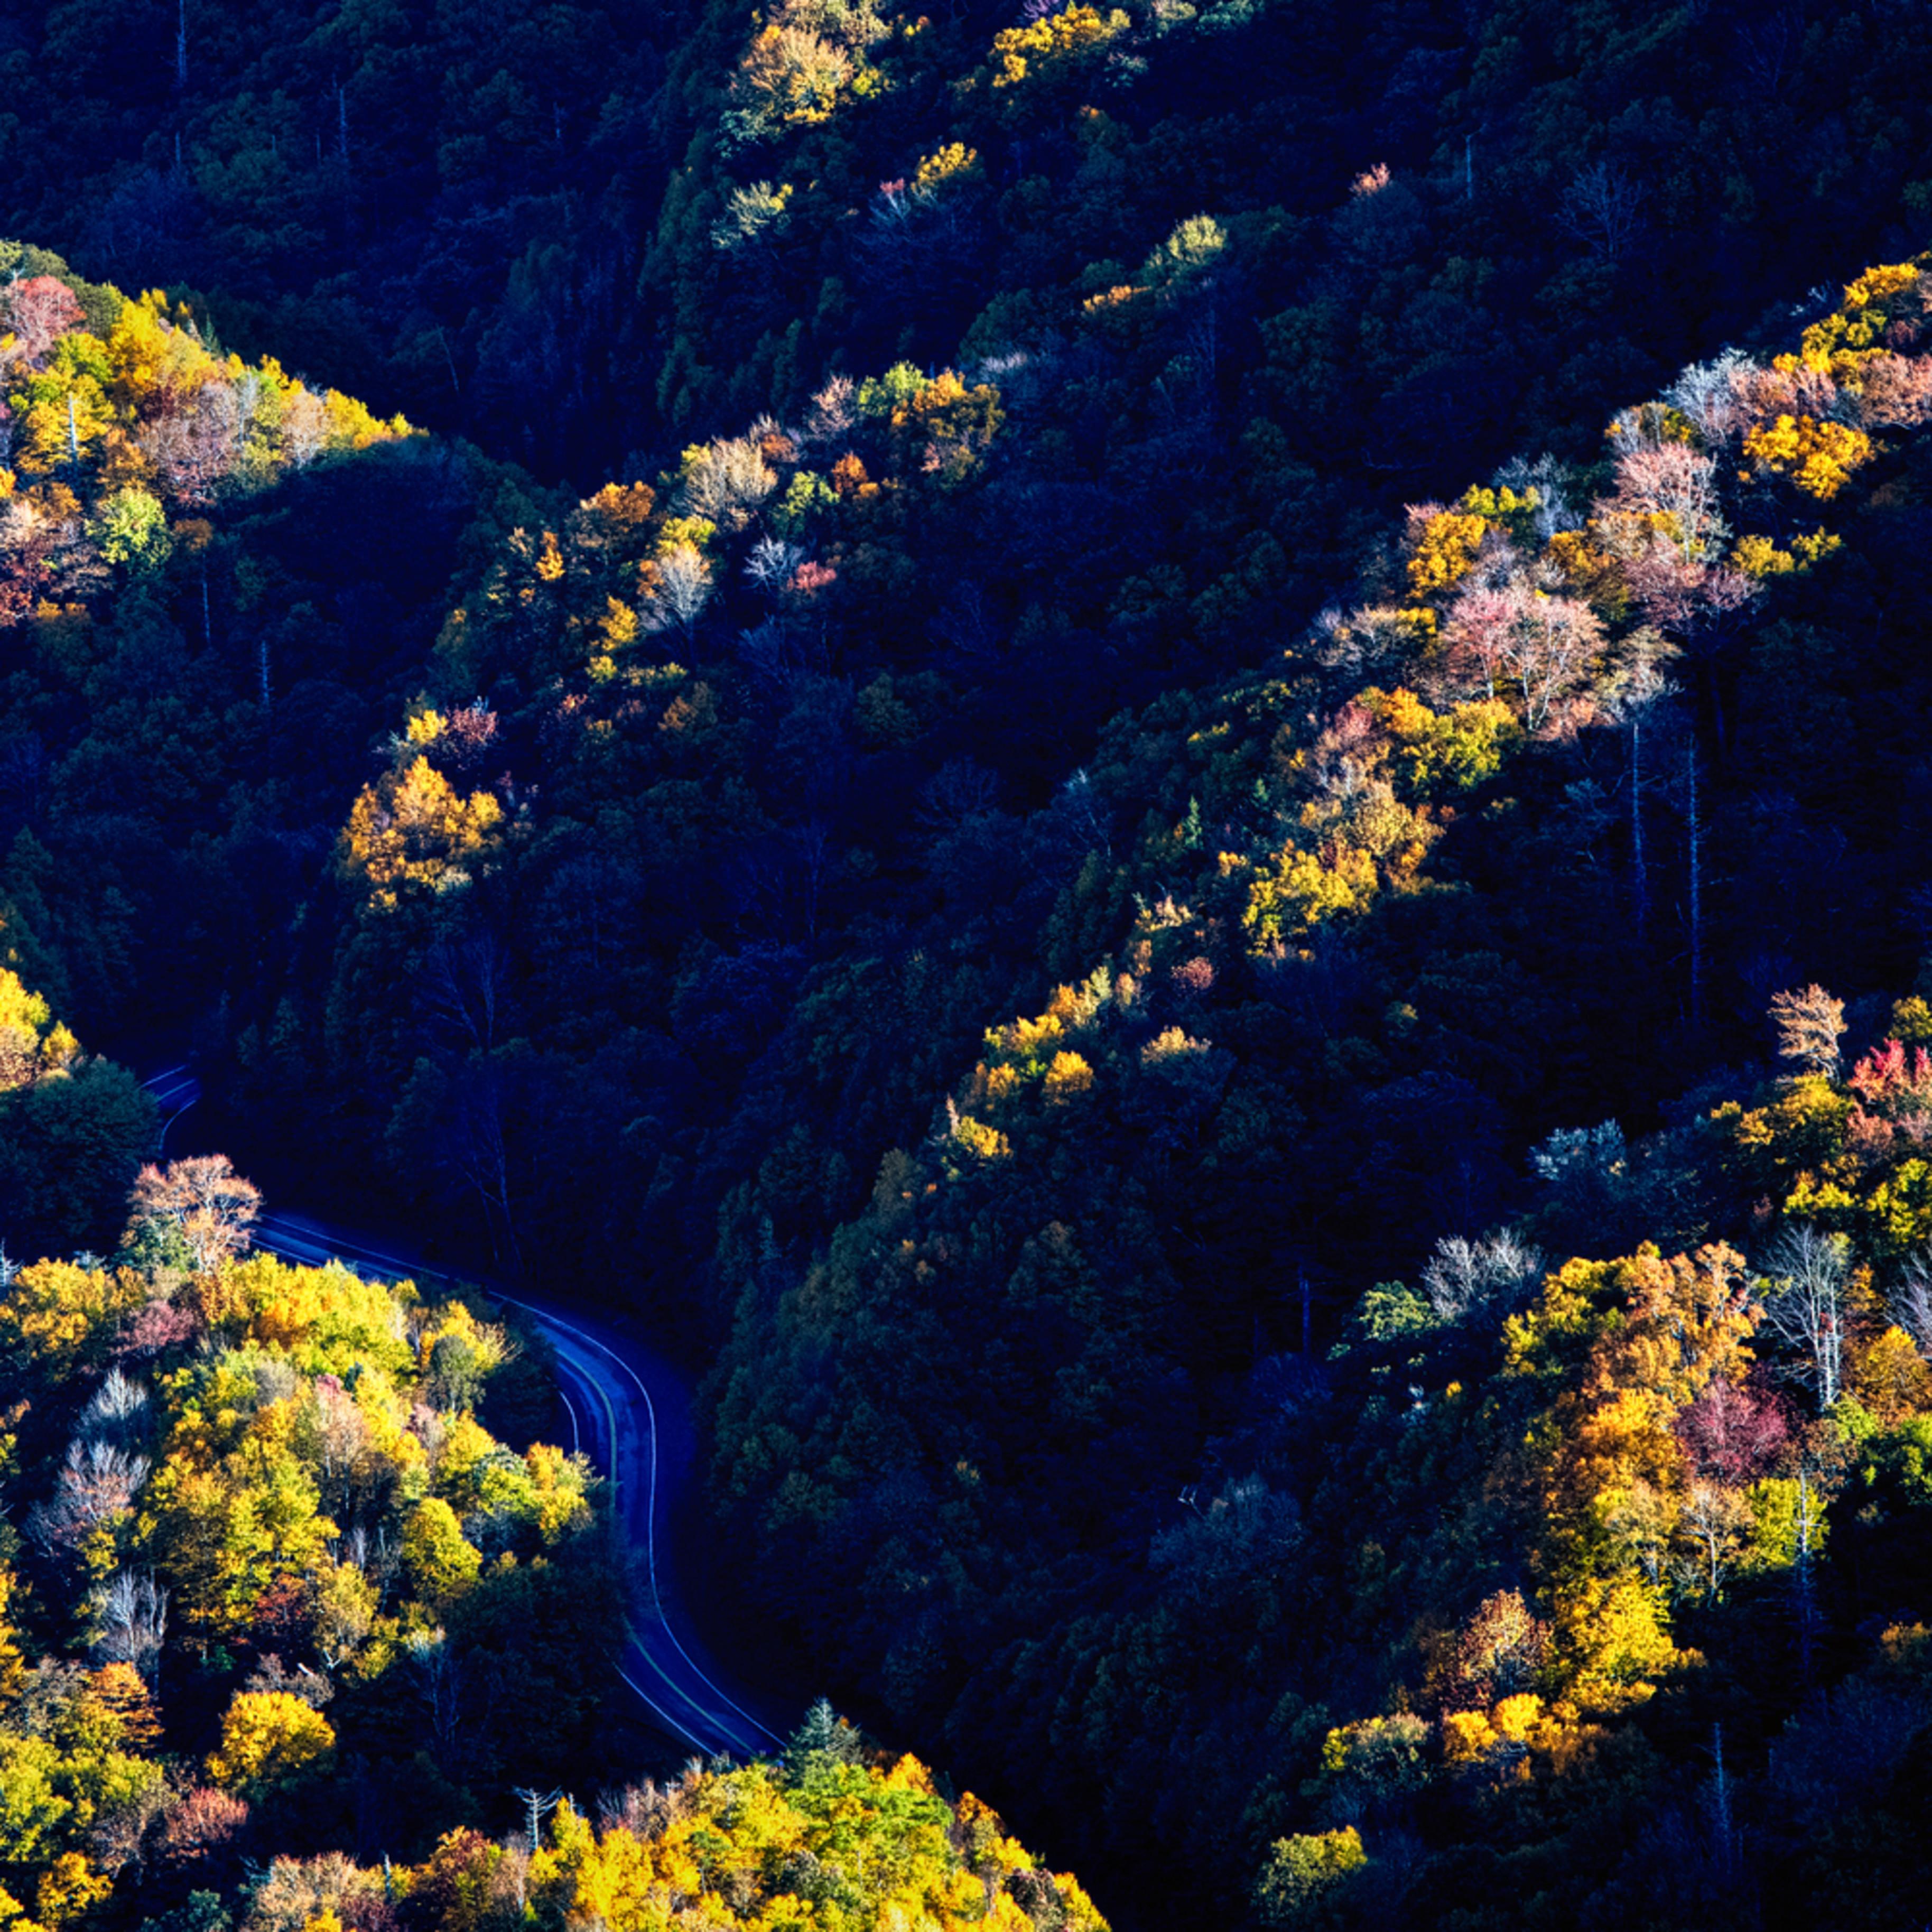 ac16861 edit edit autumn drive 01 ourbh9